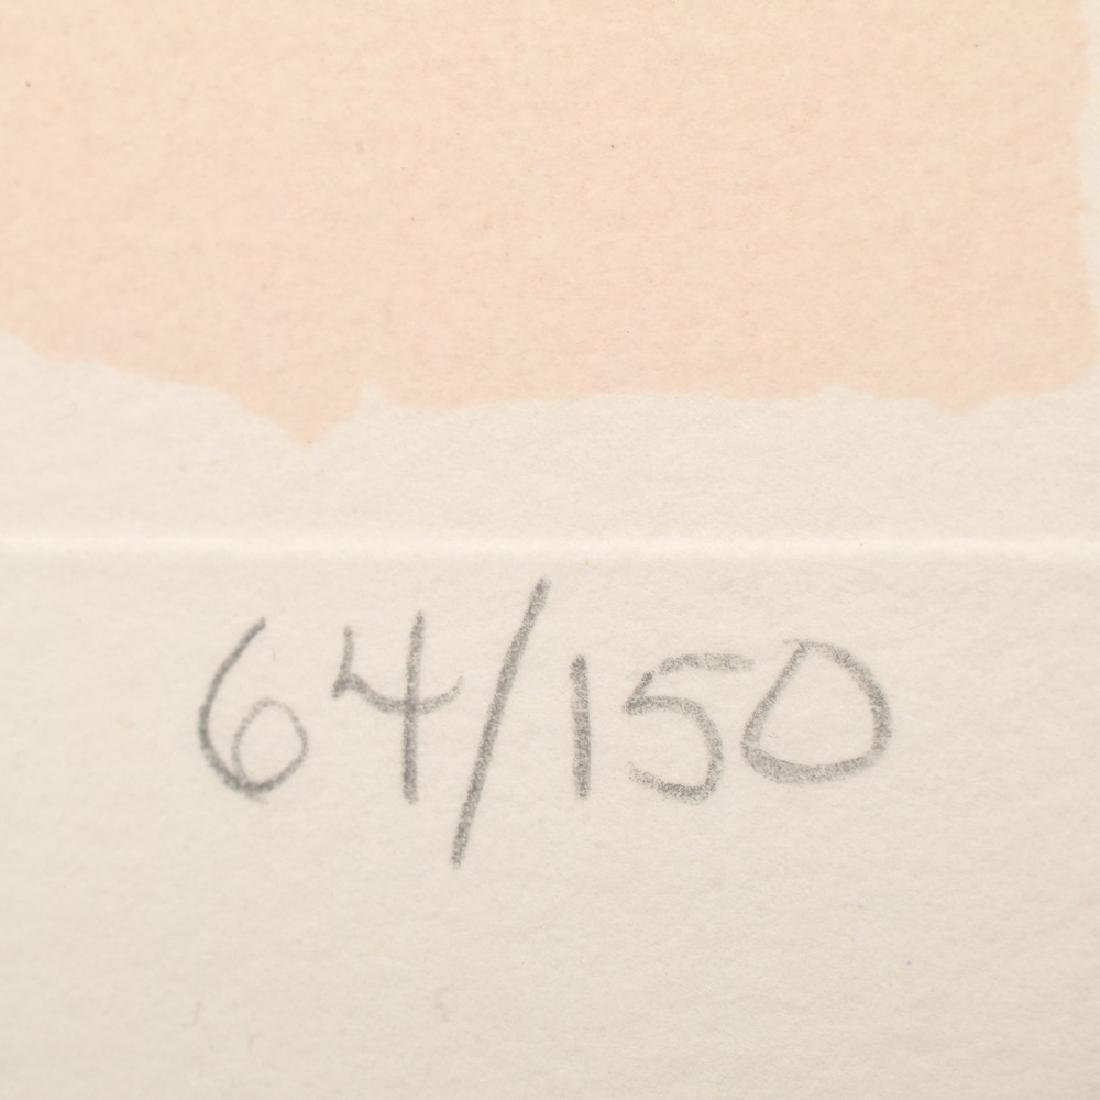 Robert Motherwell Screenprint, Signed Edition - 2